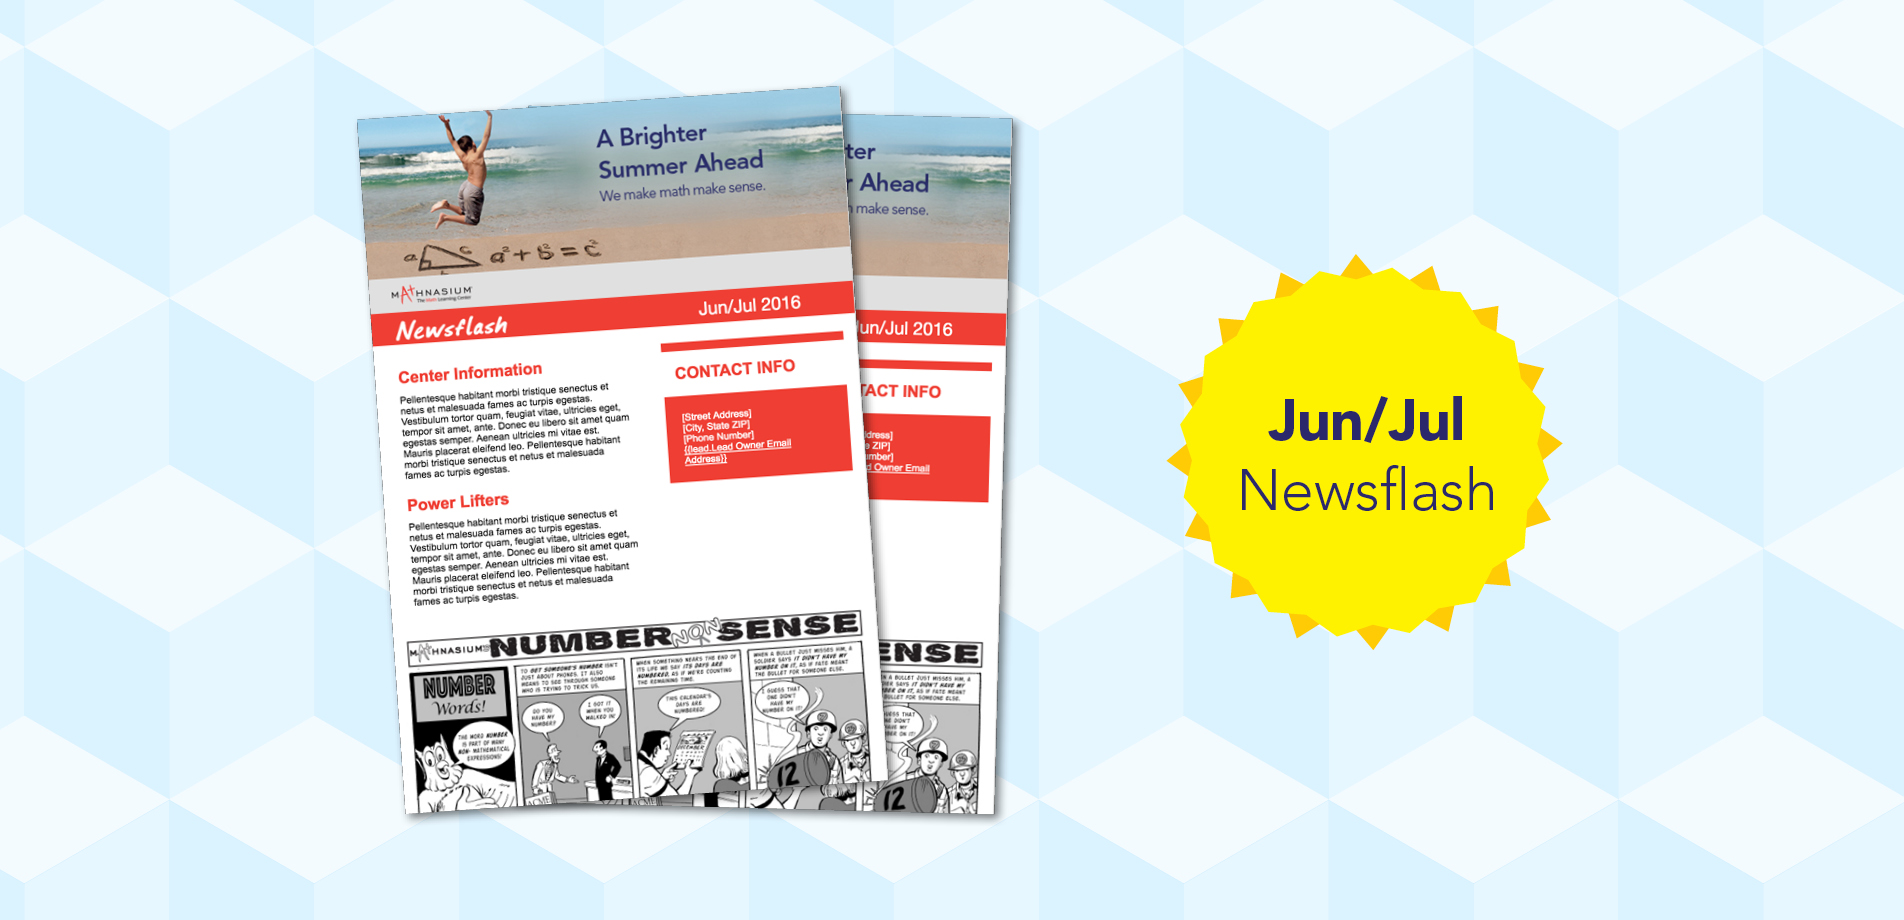 Sample-Email-Newsflash-June-2016